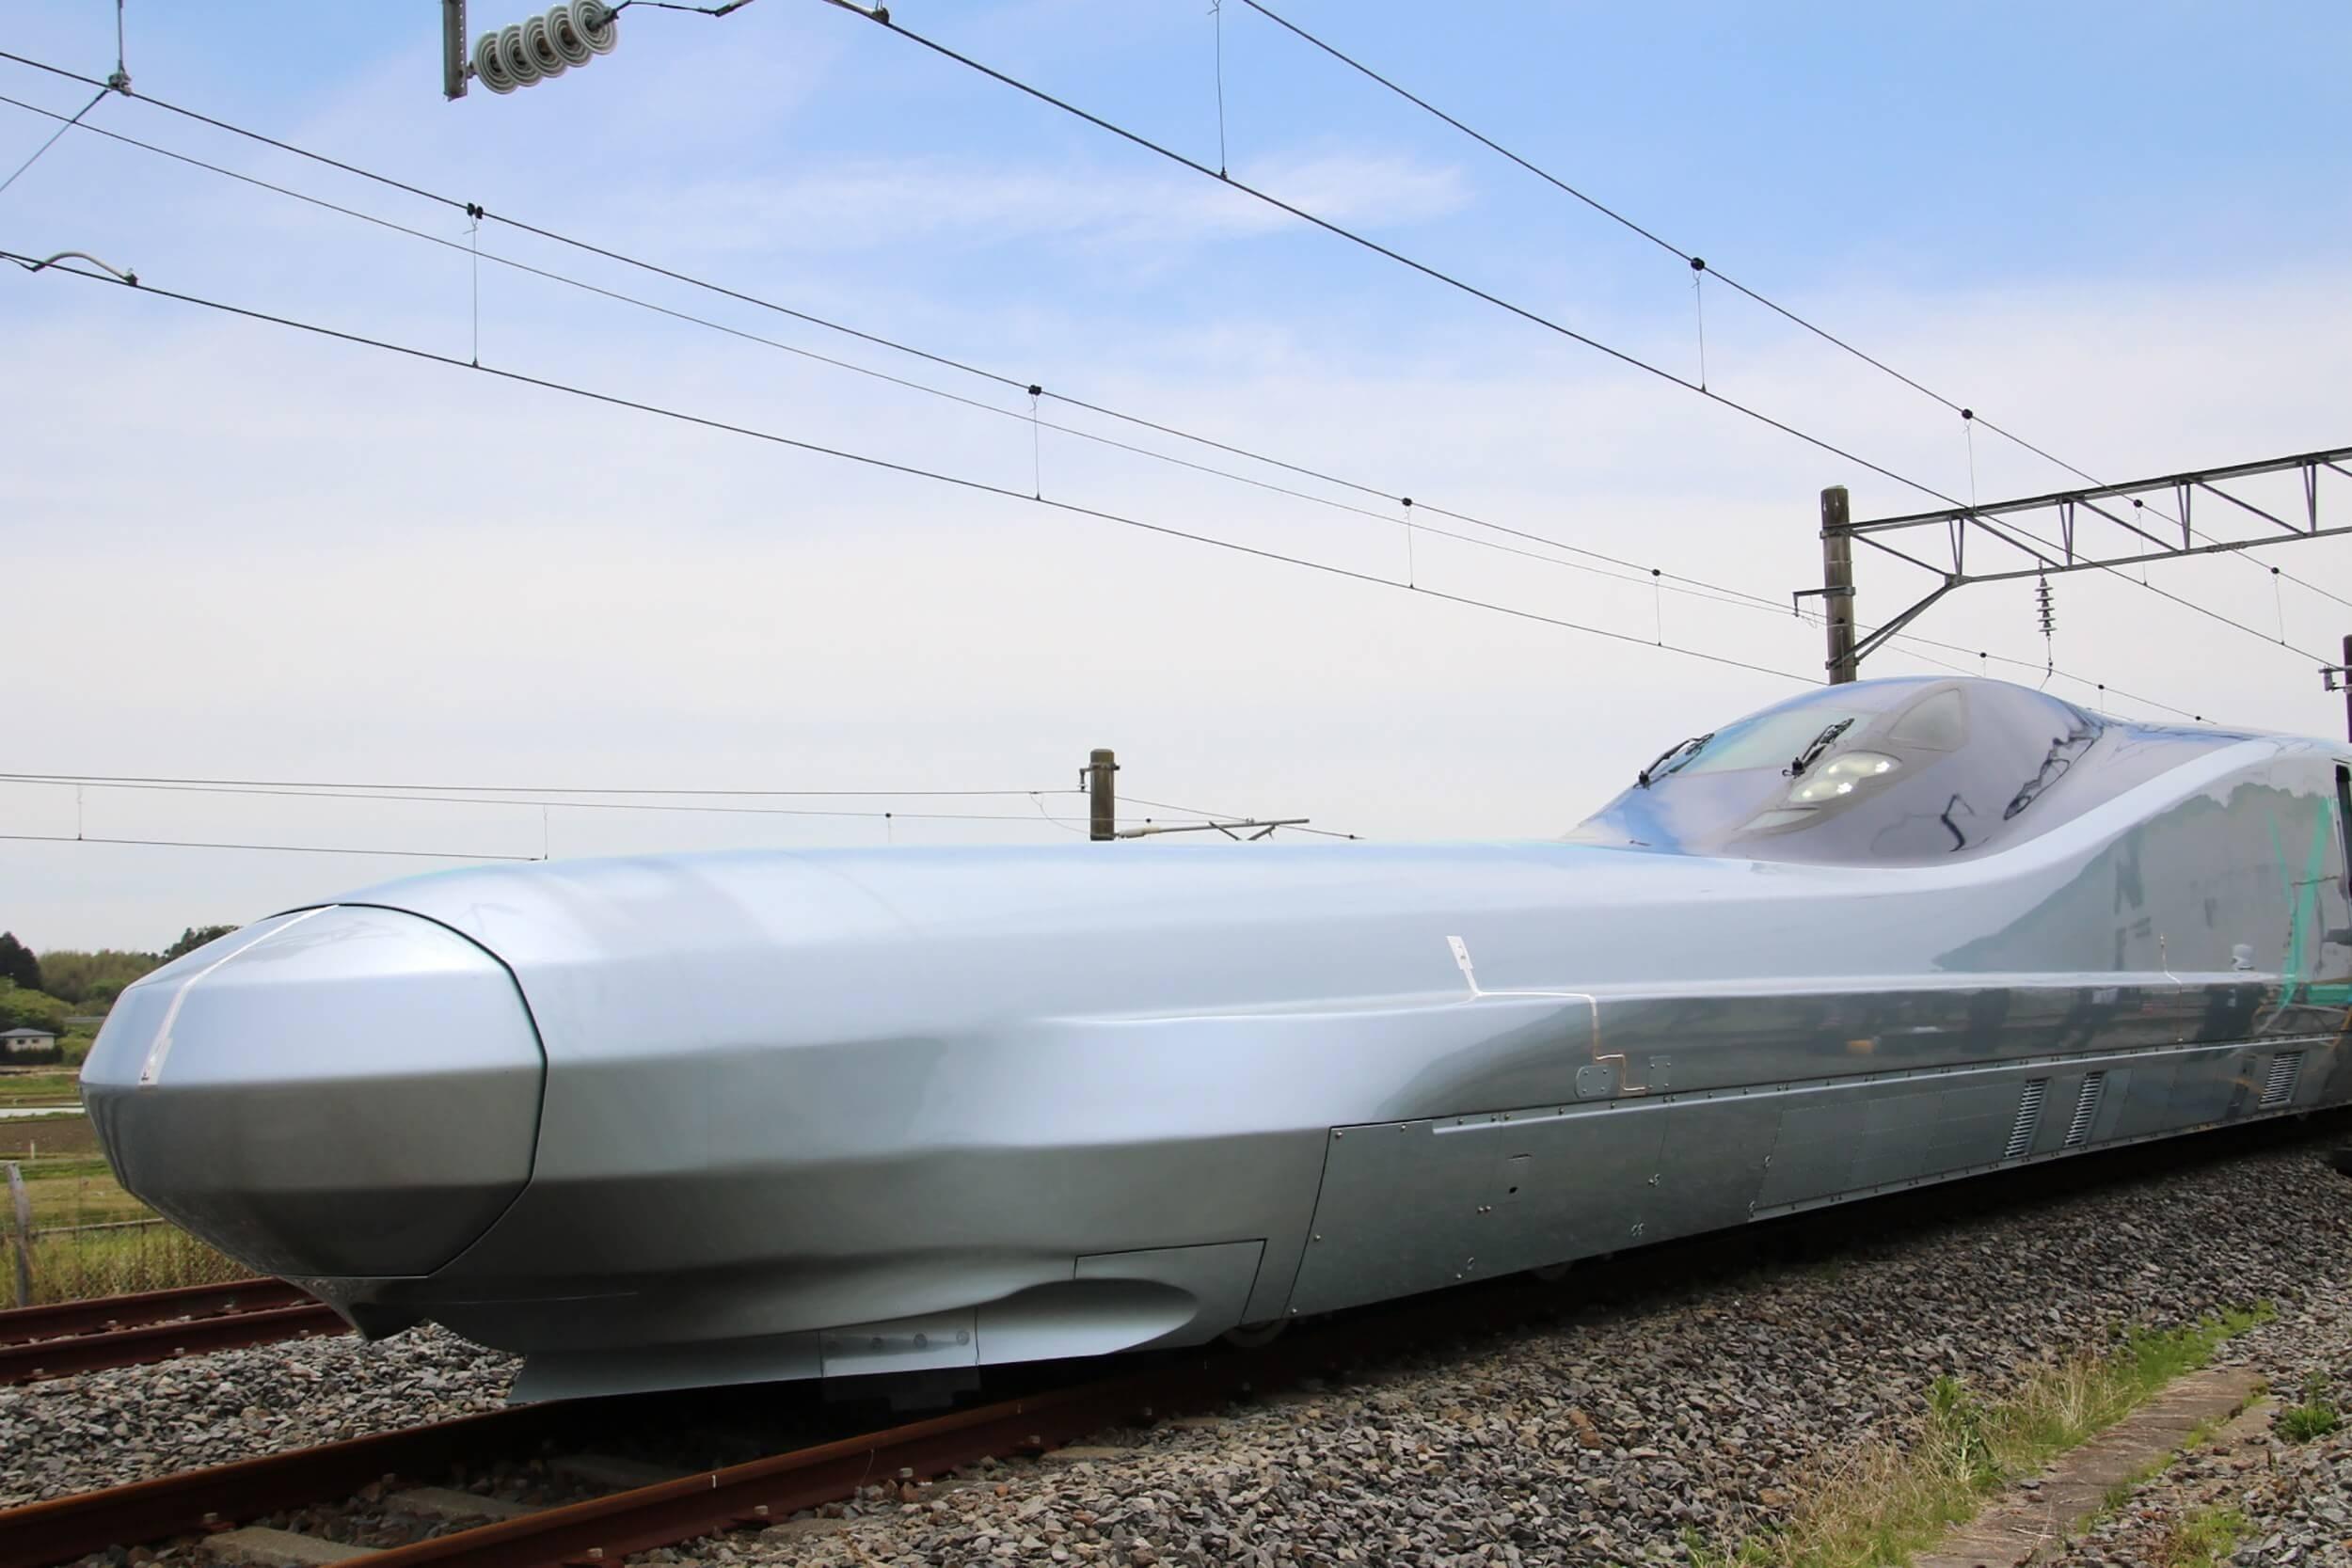 Prototyp japonského rýchlovlaku Alfa-X brázdi železnice rýchlosťou 400 km/h